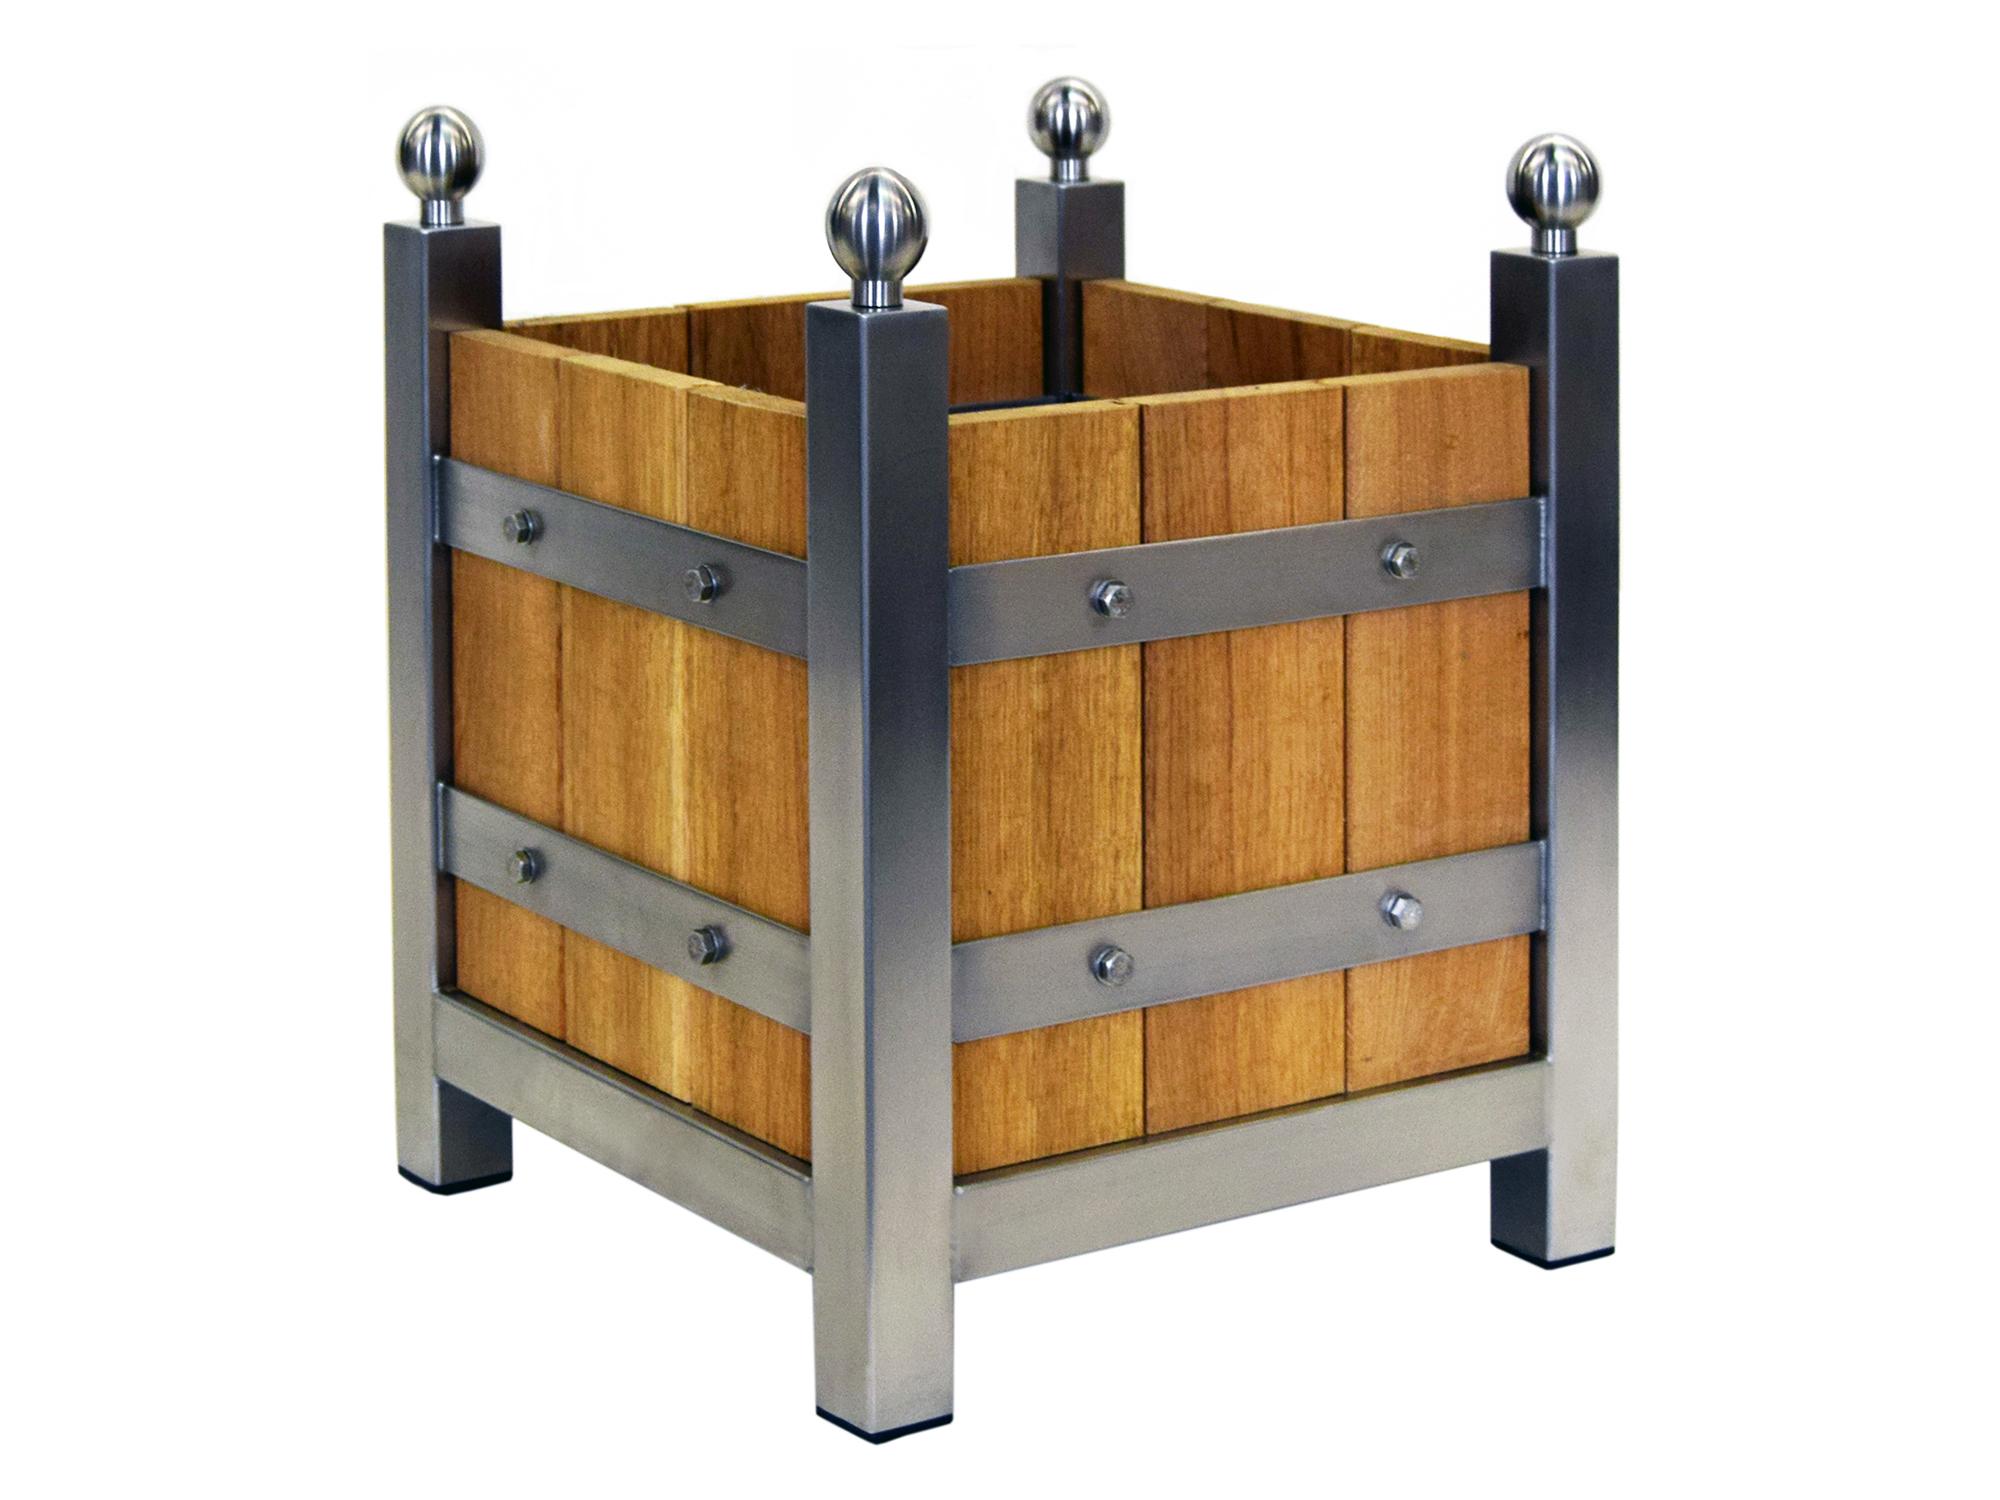 caisses de versailles franz sische pflanzk sten gartenmoebel. Black Bedroom Furniture Sets. Home Design Ideas